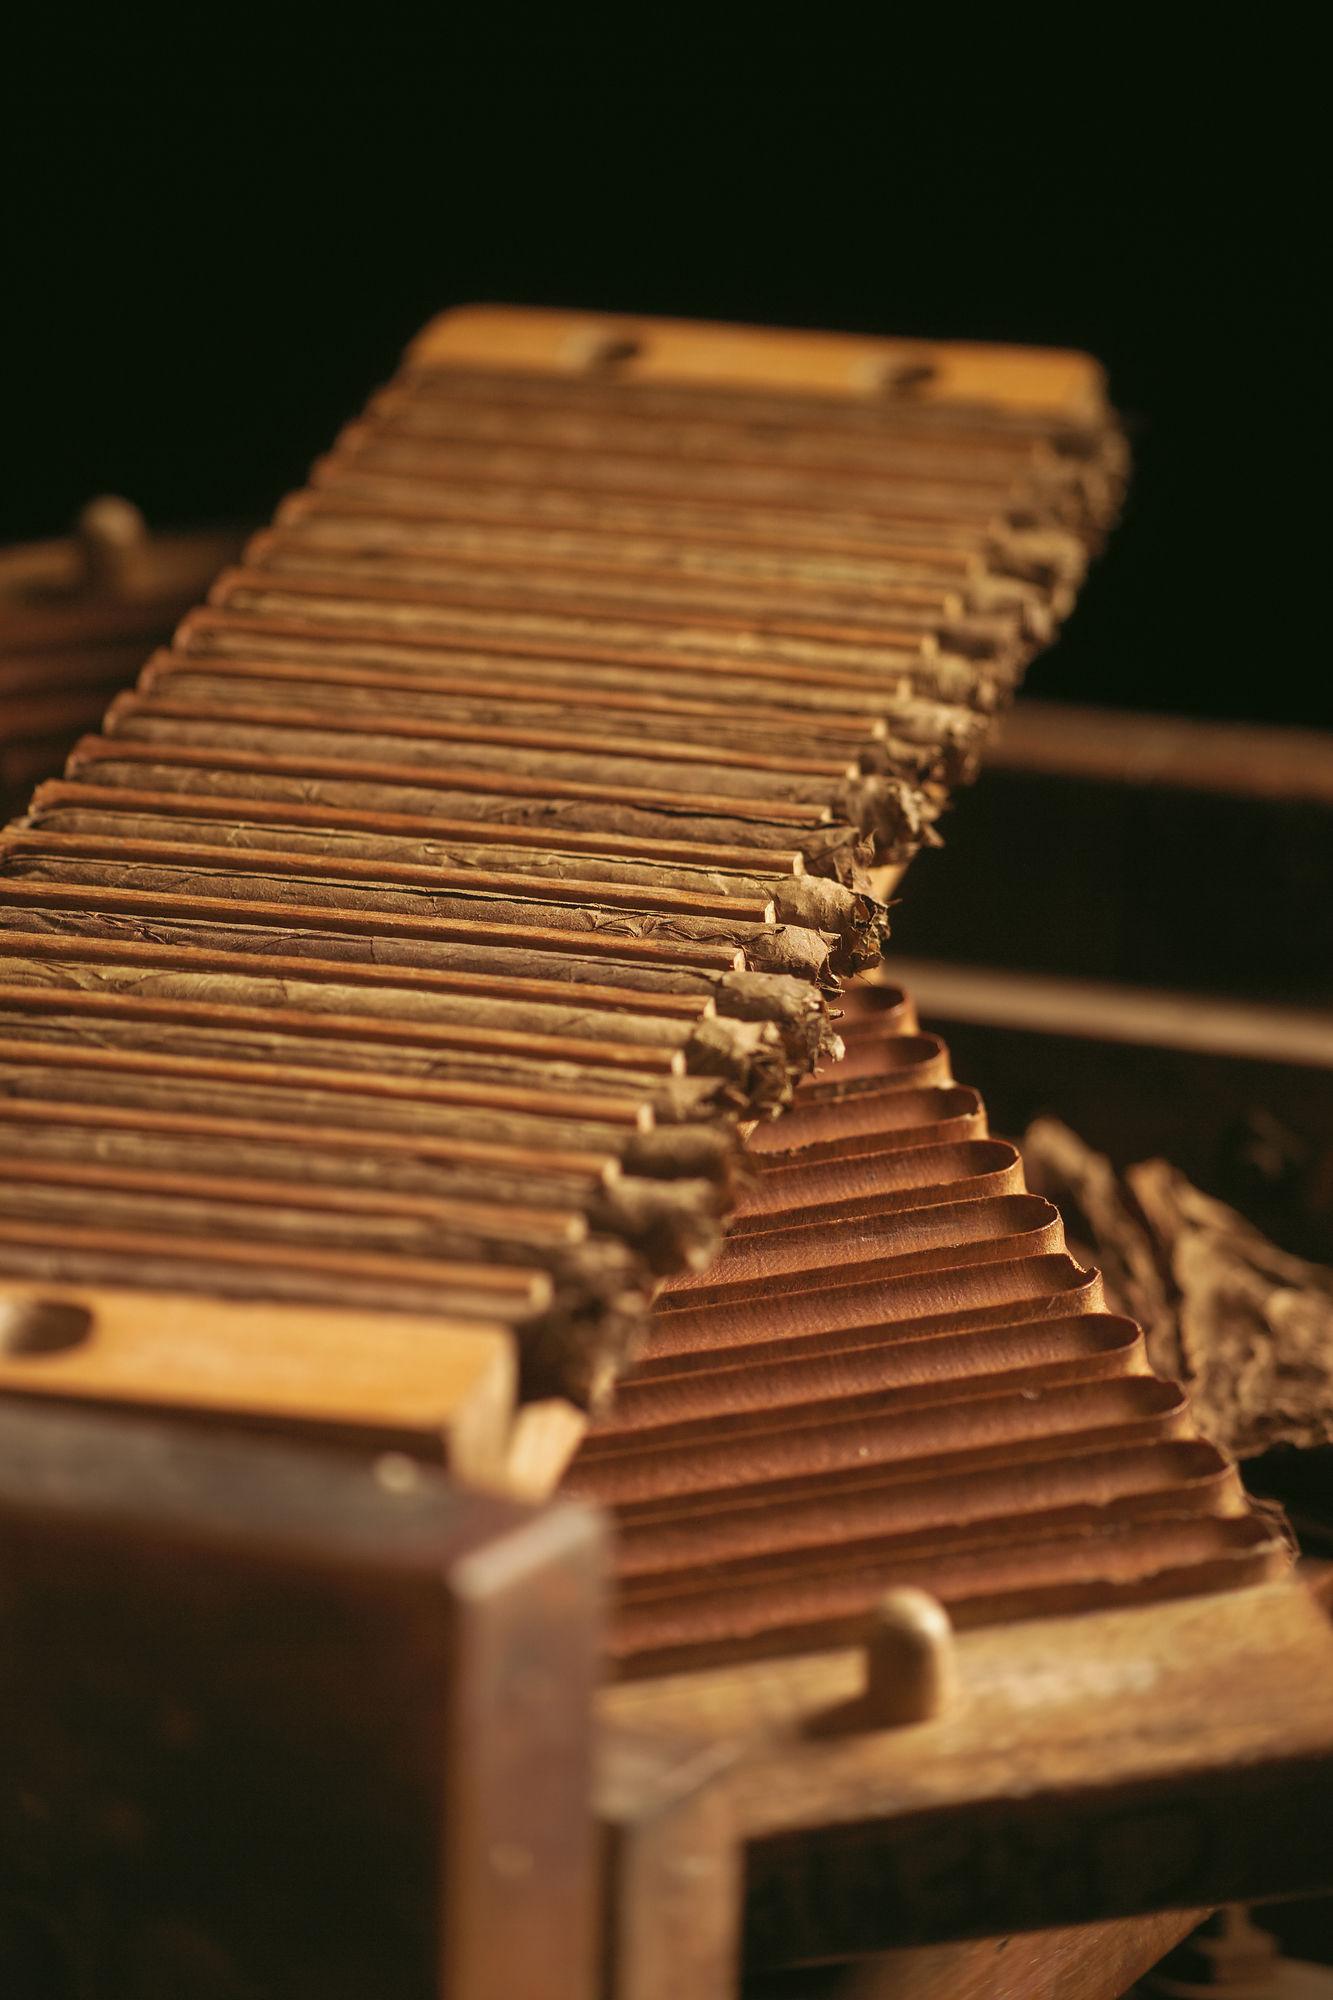 Cigar Manufactory La Palma/Canary Islands